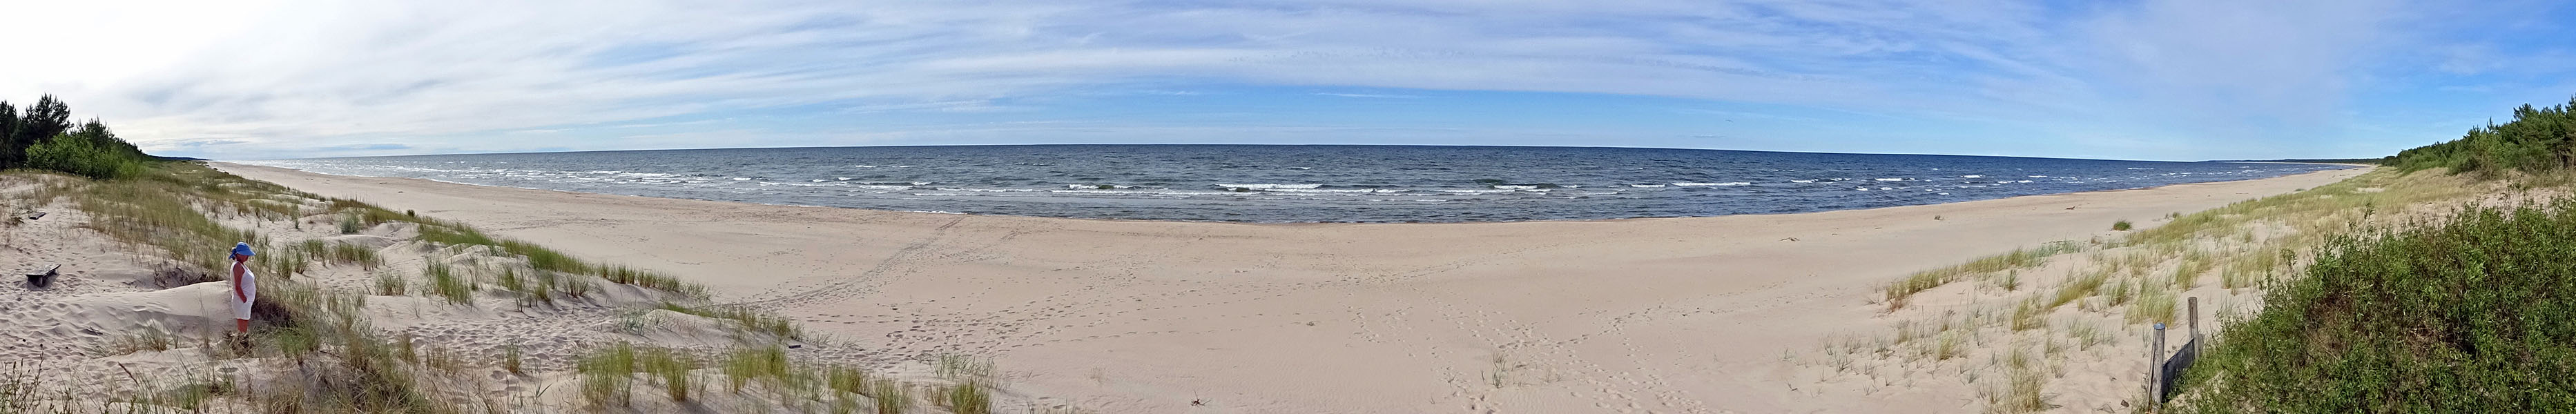 Sabine am Strand whe